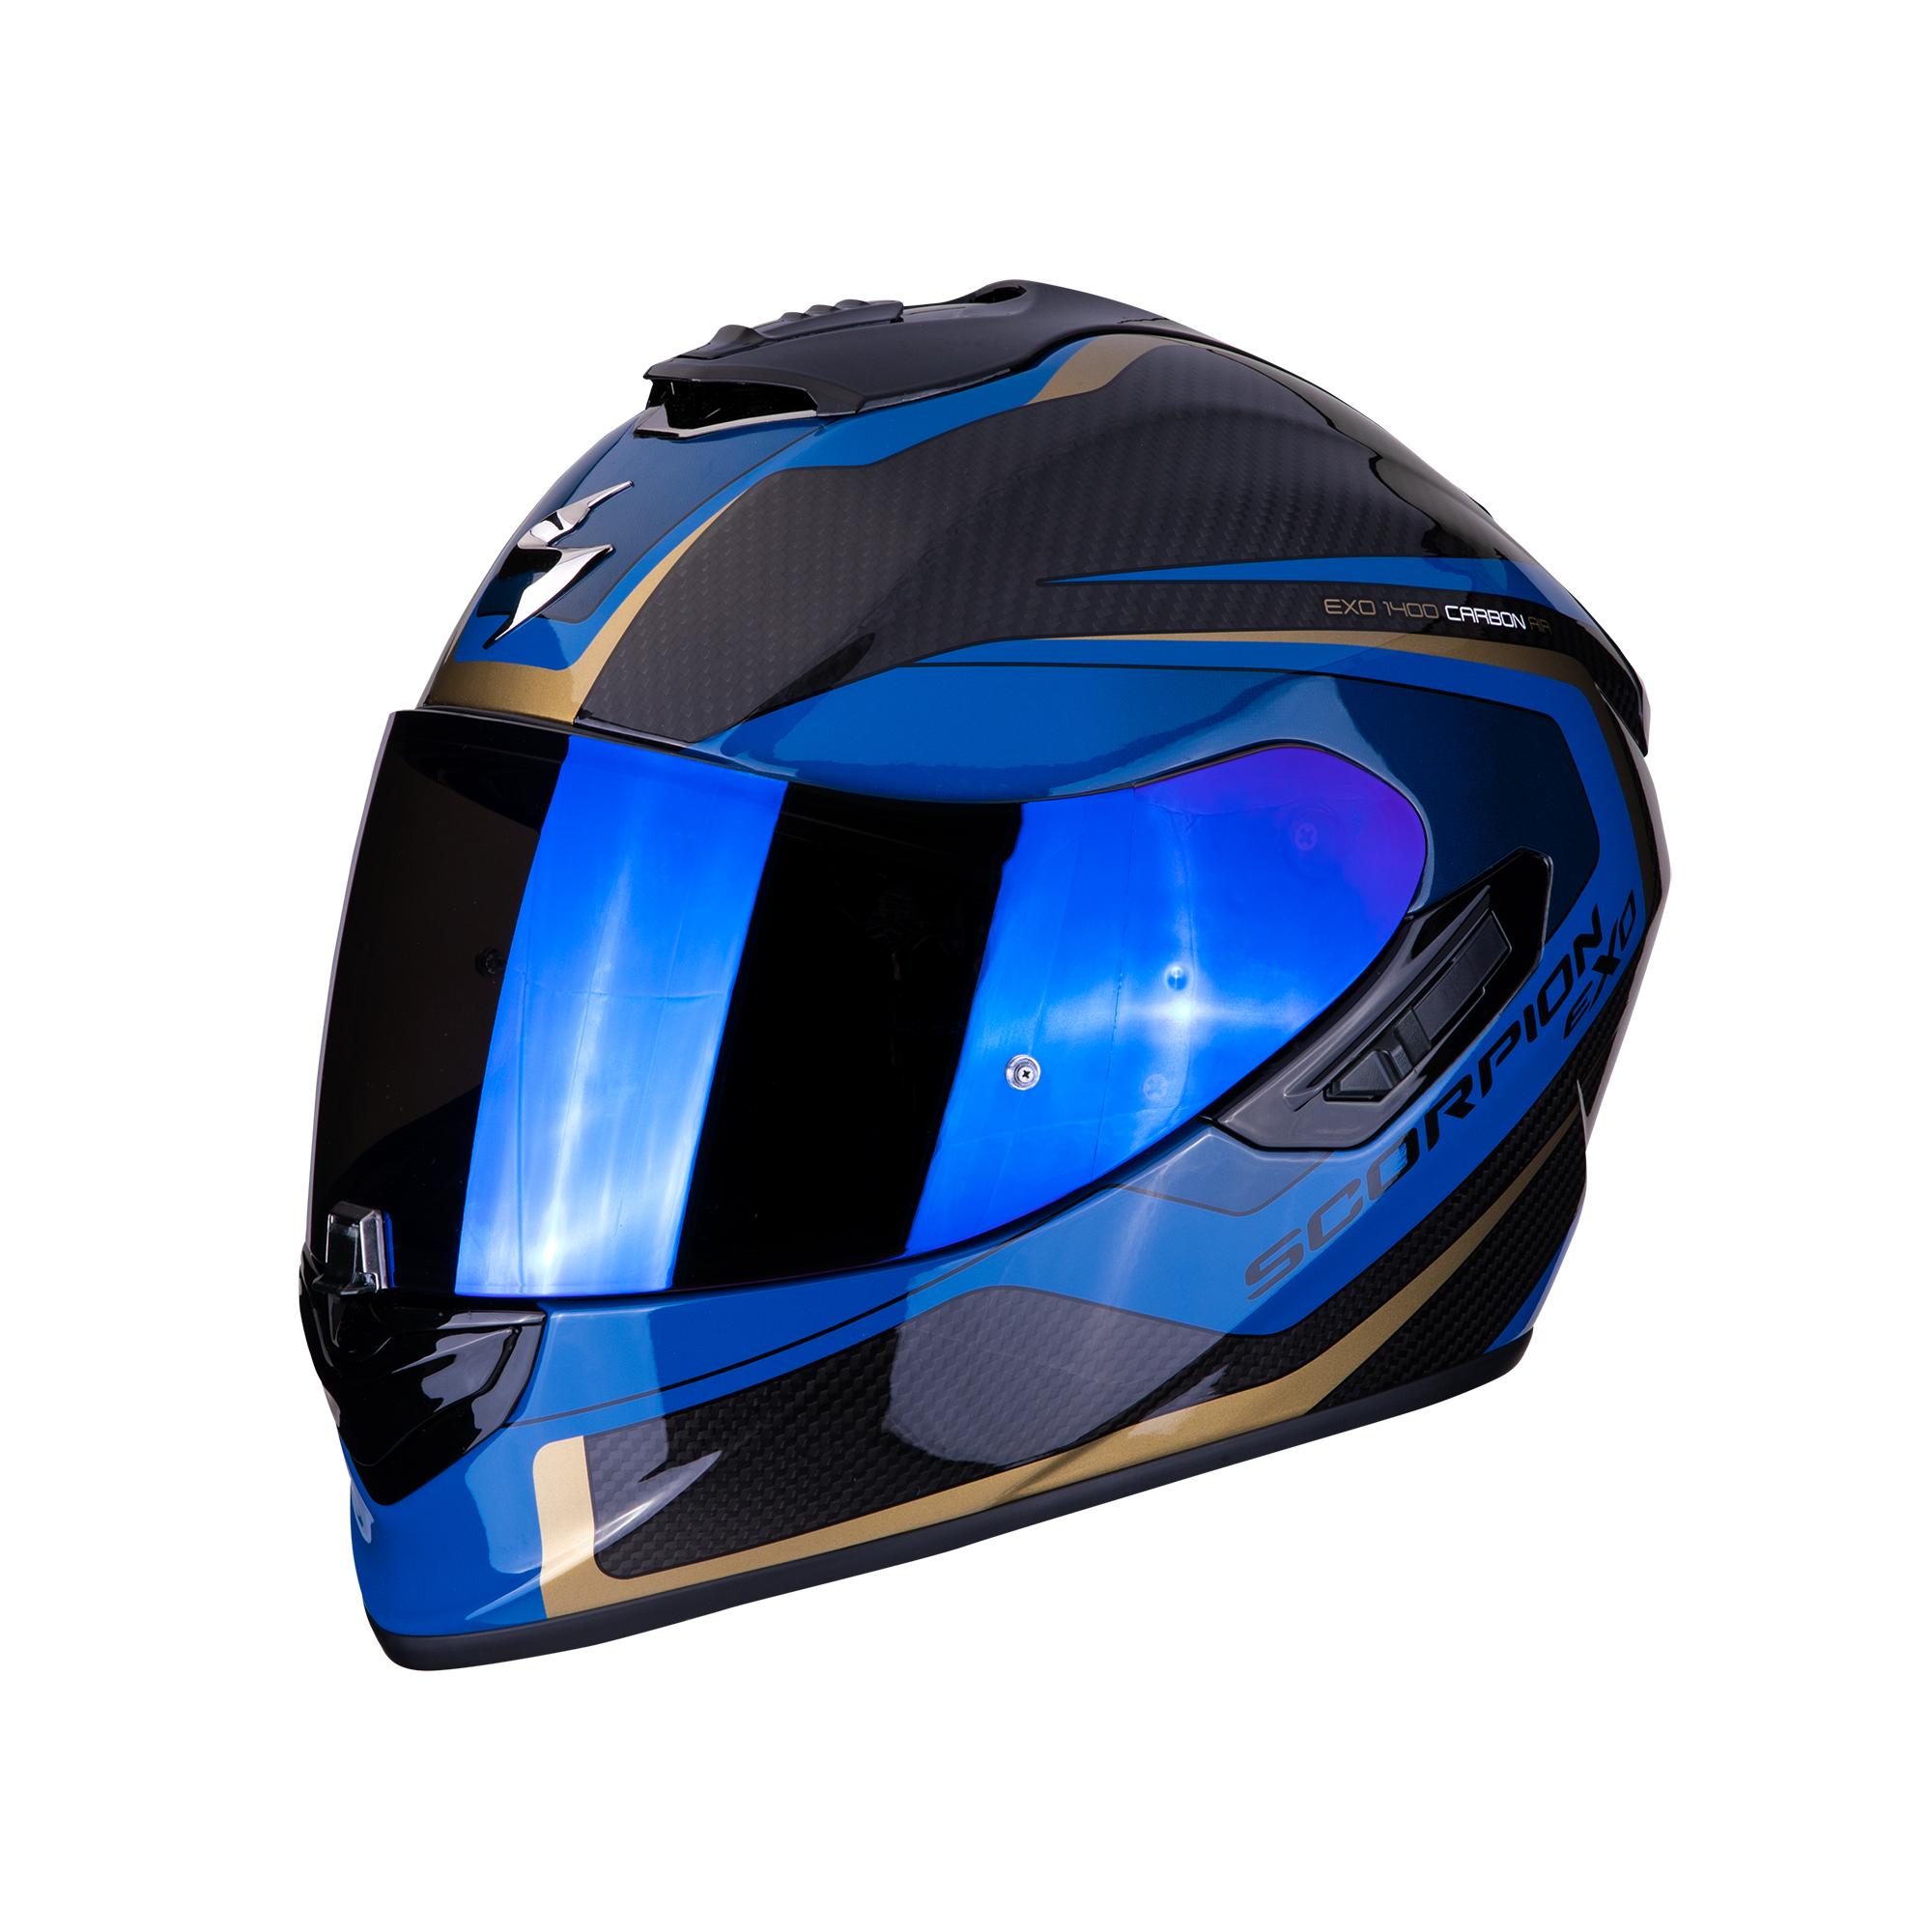 casque scorpion exo 1400 air carbon esprit s team motos. Black Bedroom Furniture Sets. Home Design Ideas